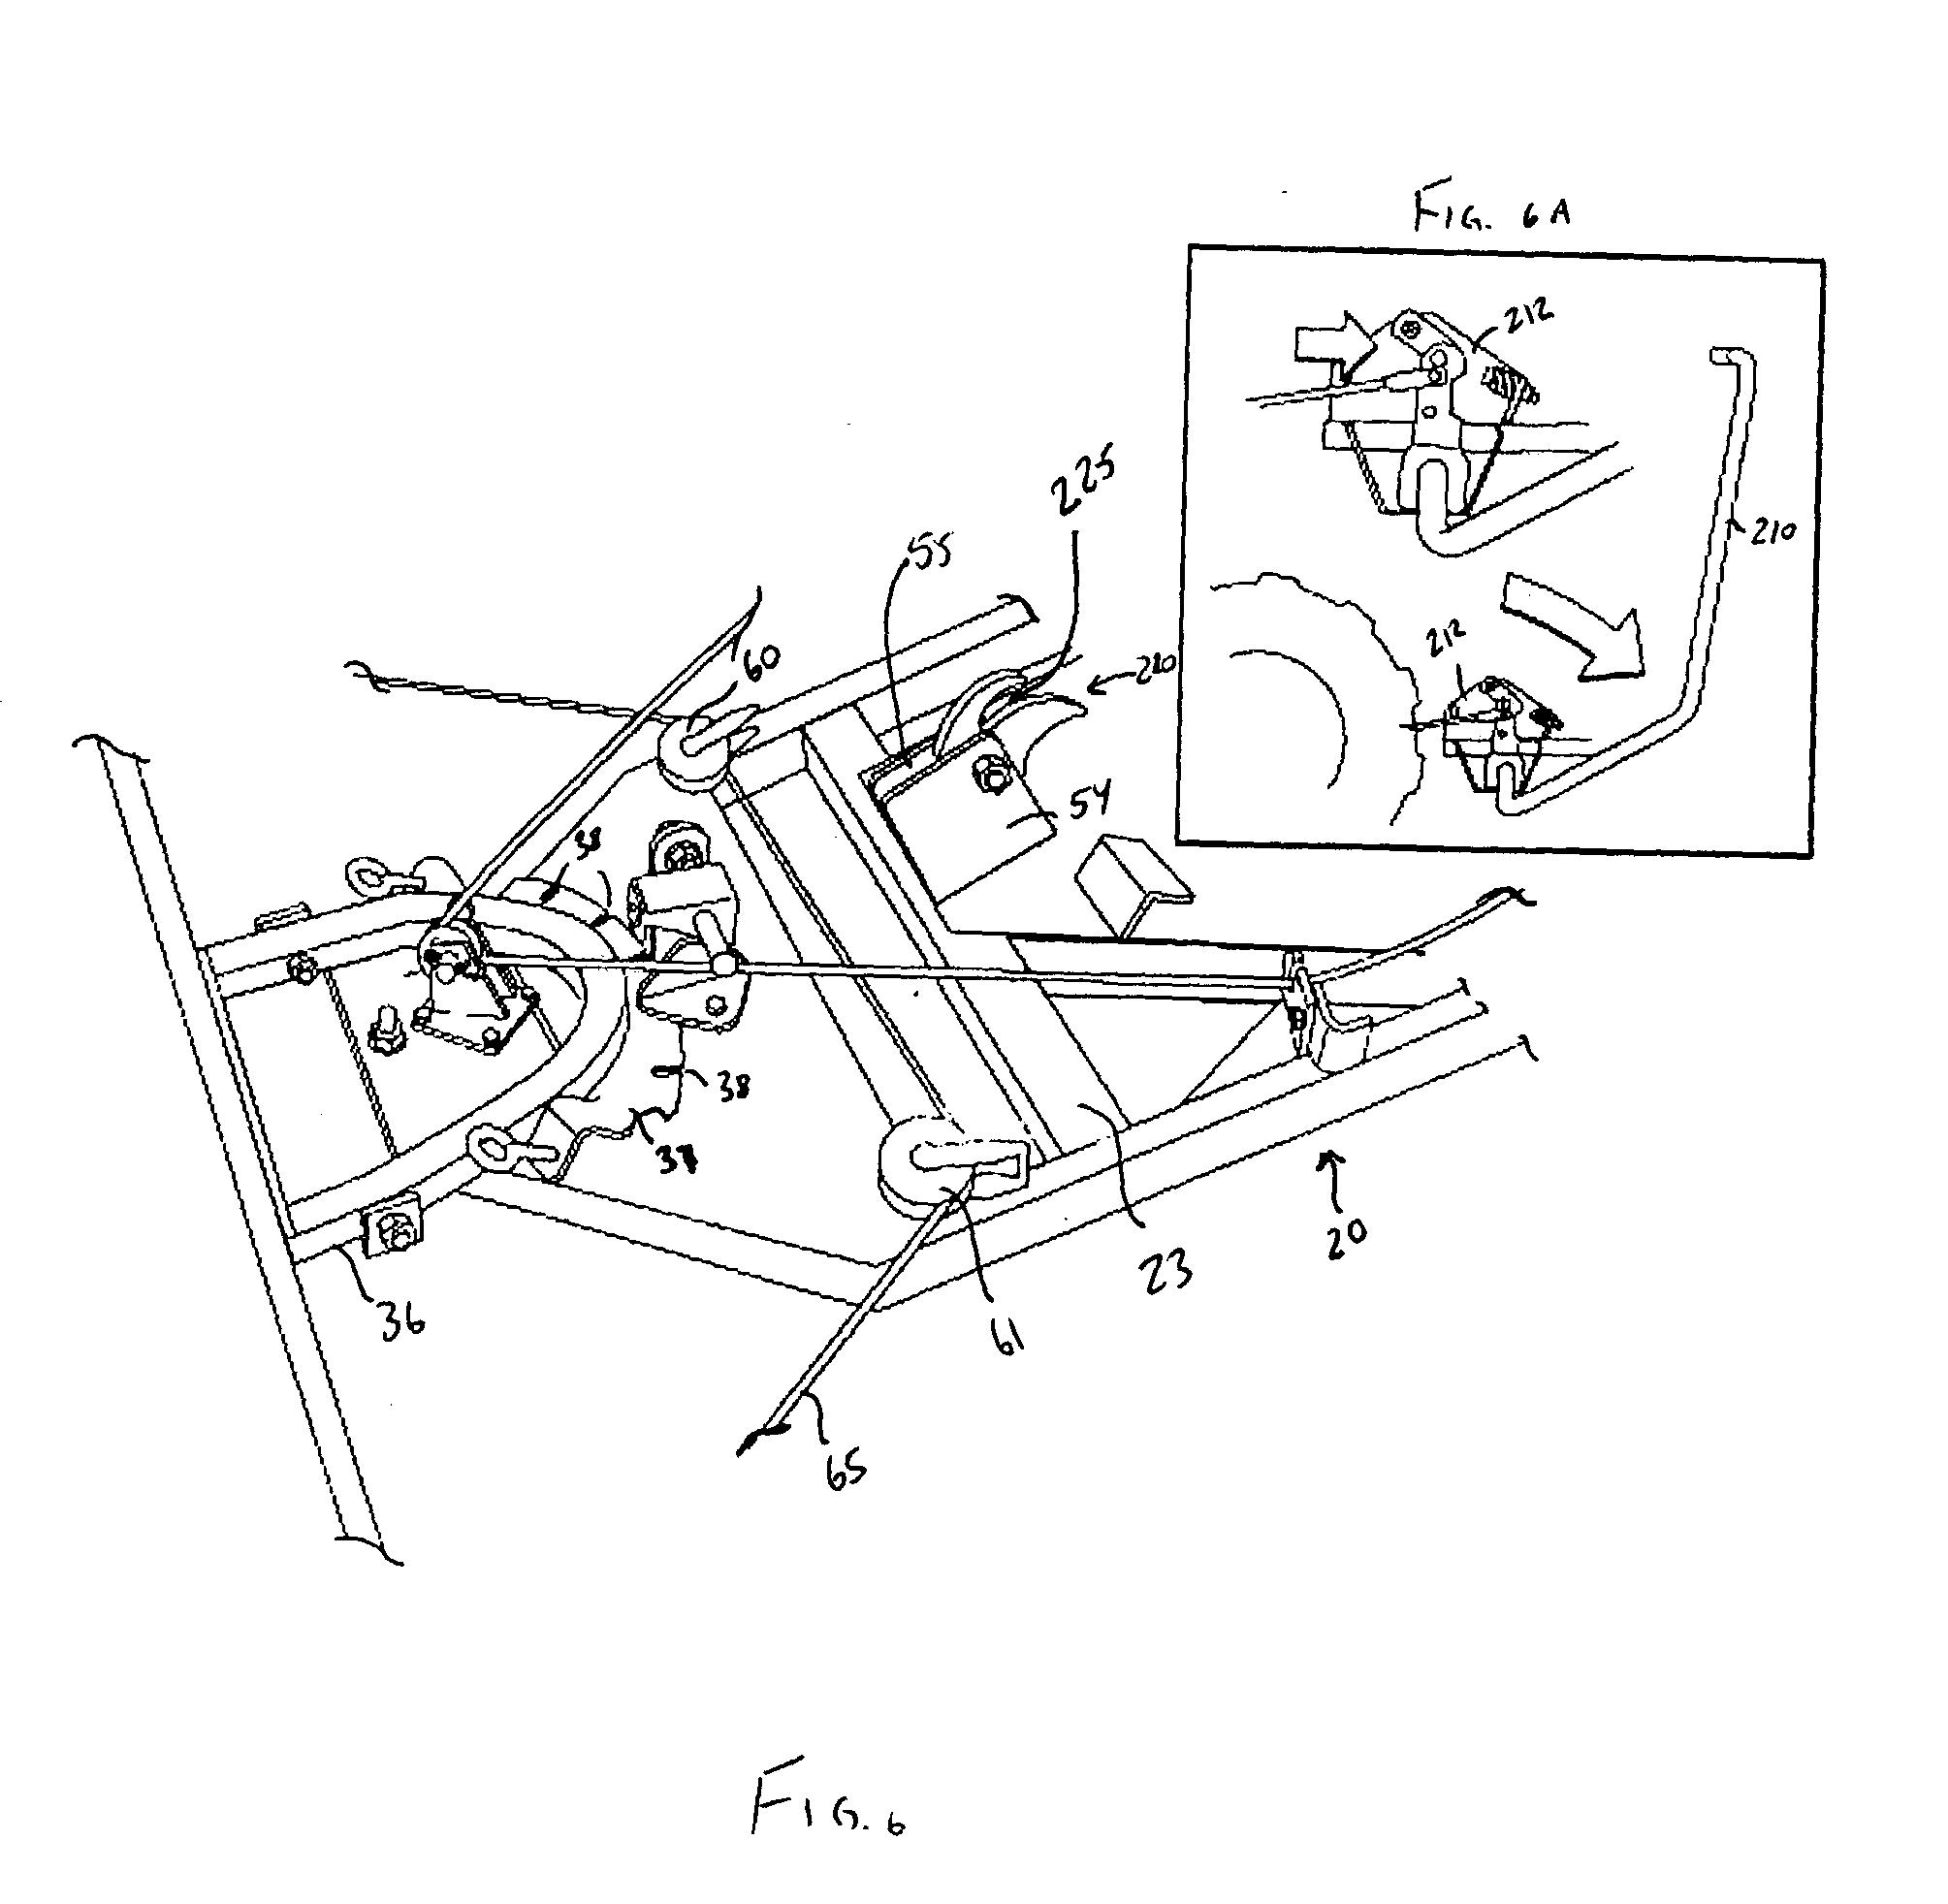 Boss V Plow Controller Mount